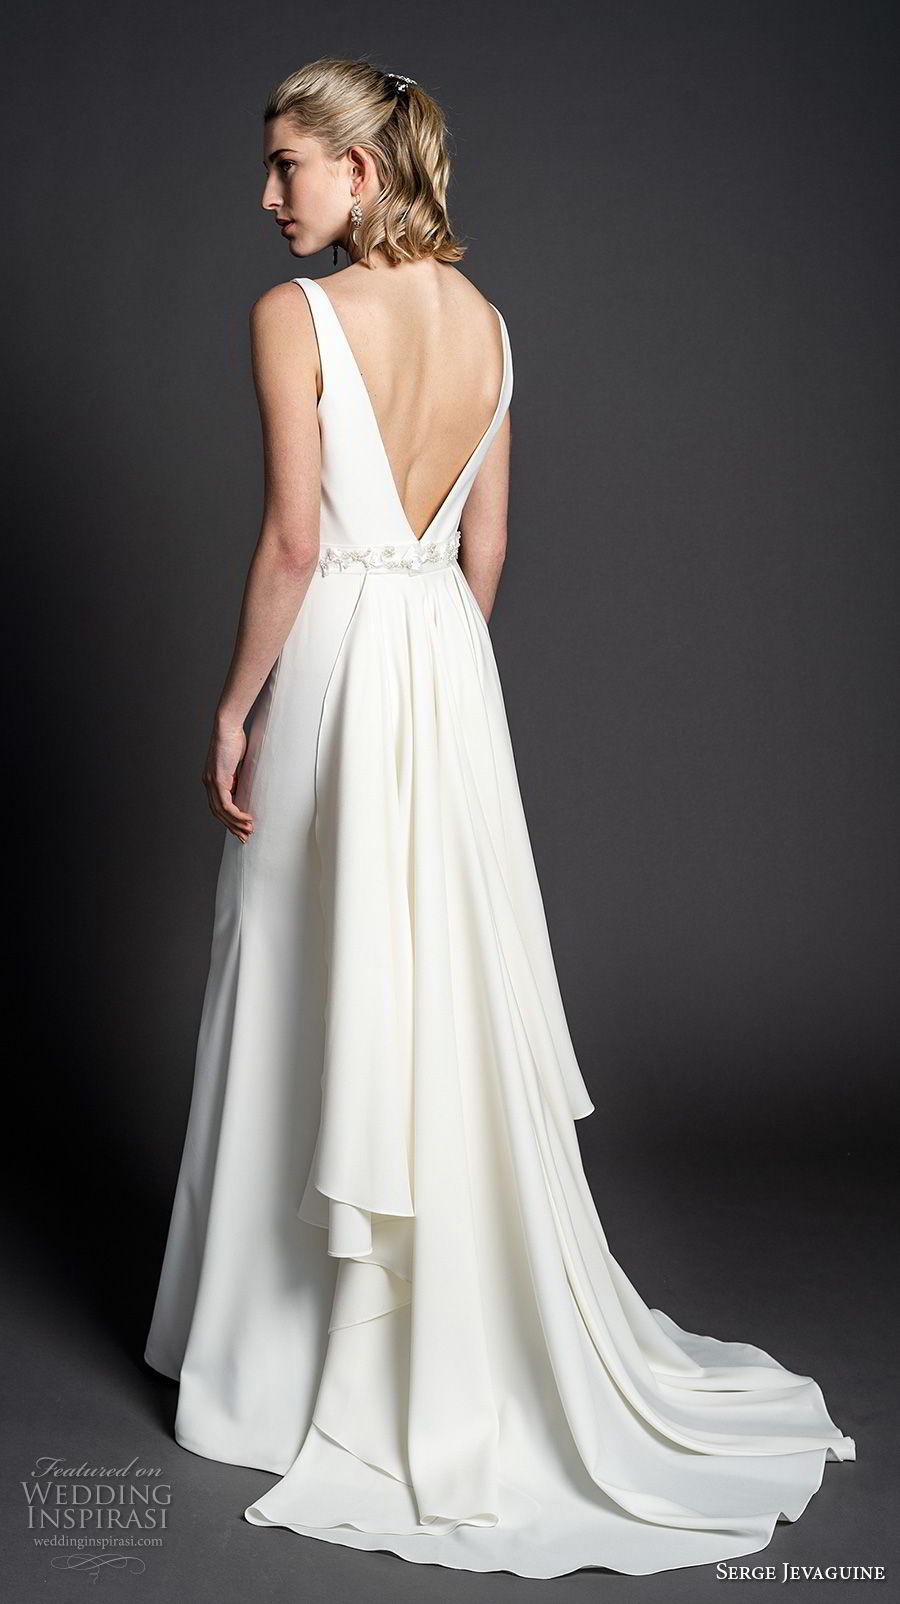 serge jevaguine 2019 bridal sleeveless deep v neck simple clean bodice minimalist elegant sheath wedding dress open v back short train (7) bv